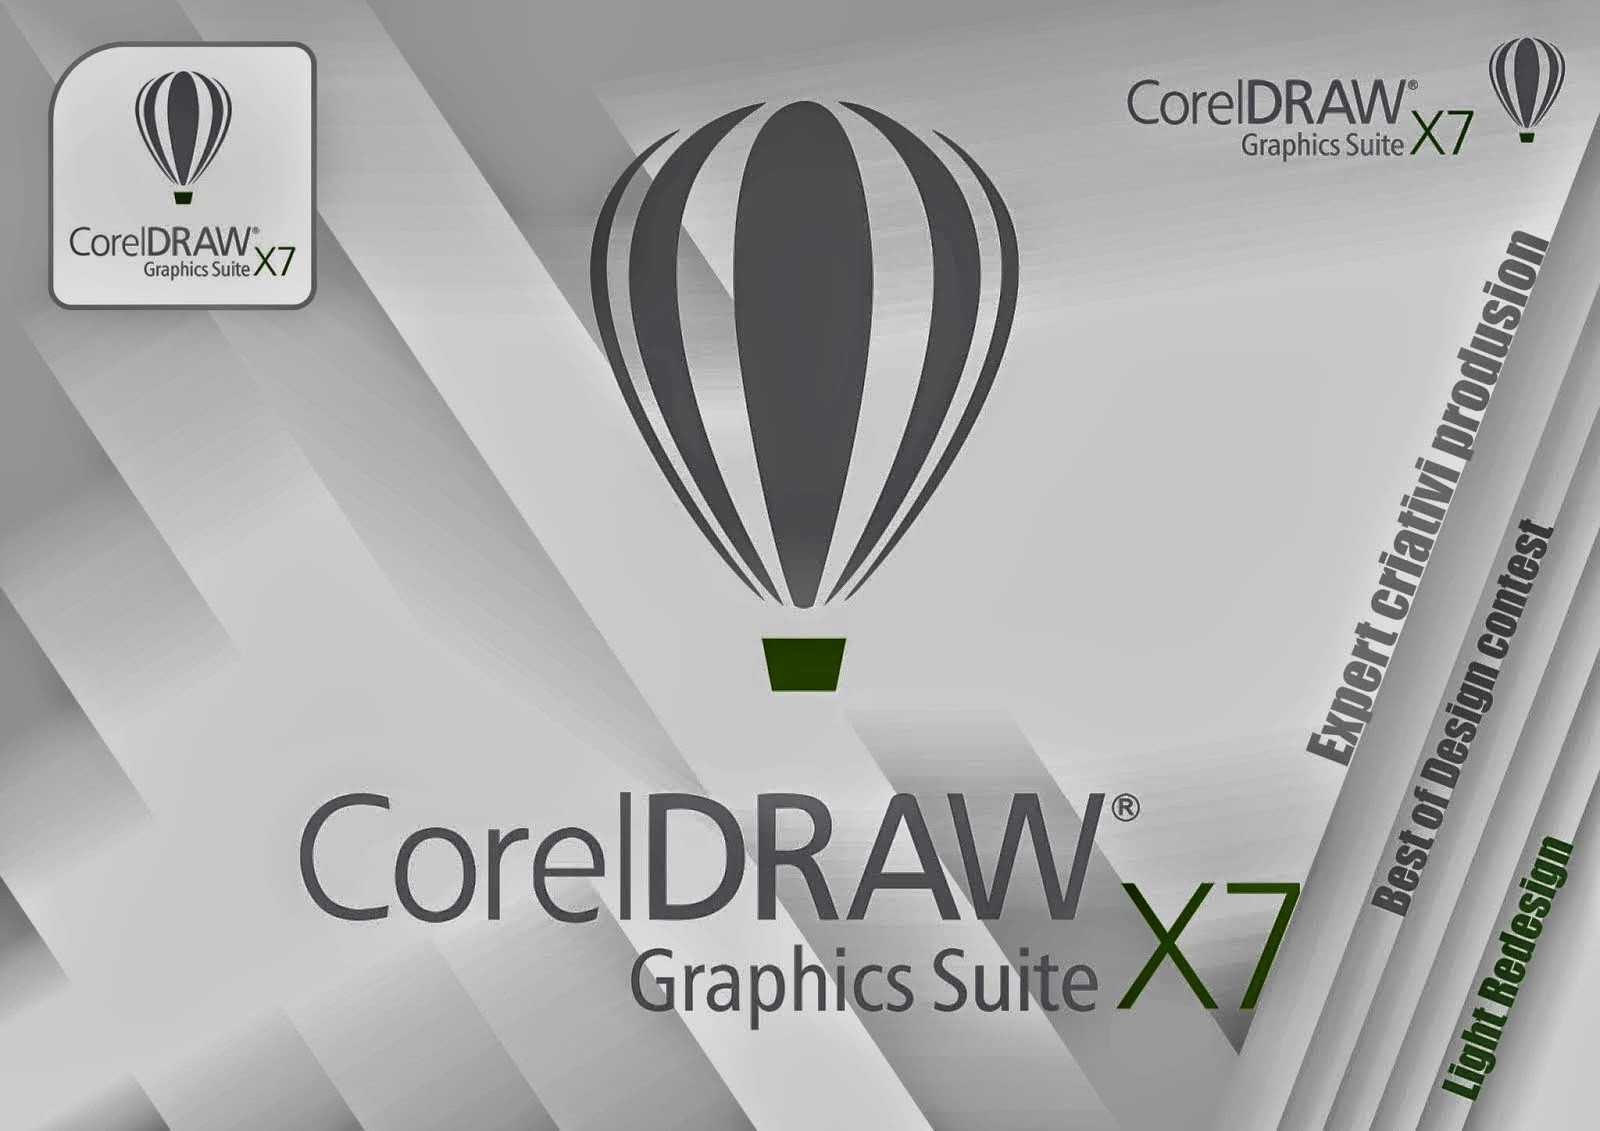 Panduan Installasi Corel Draw Graphic Suite X7